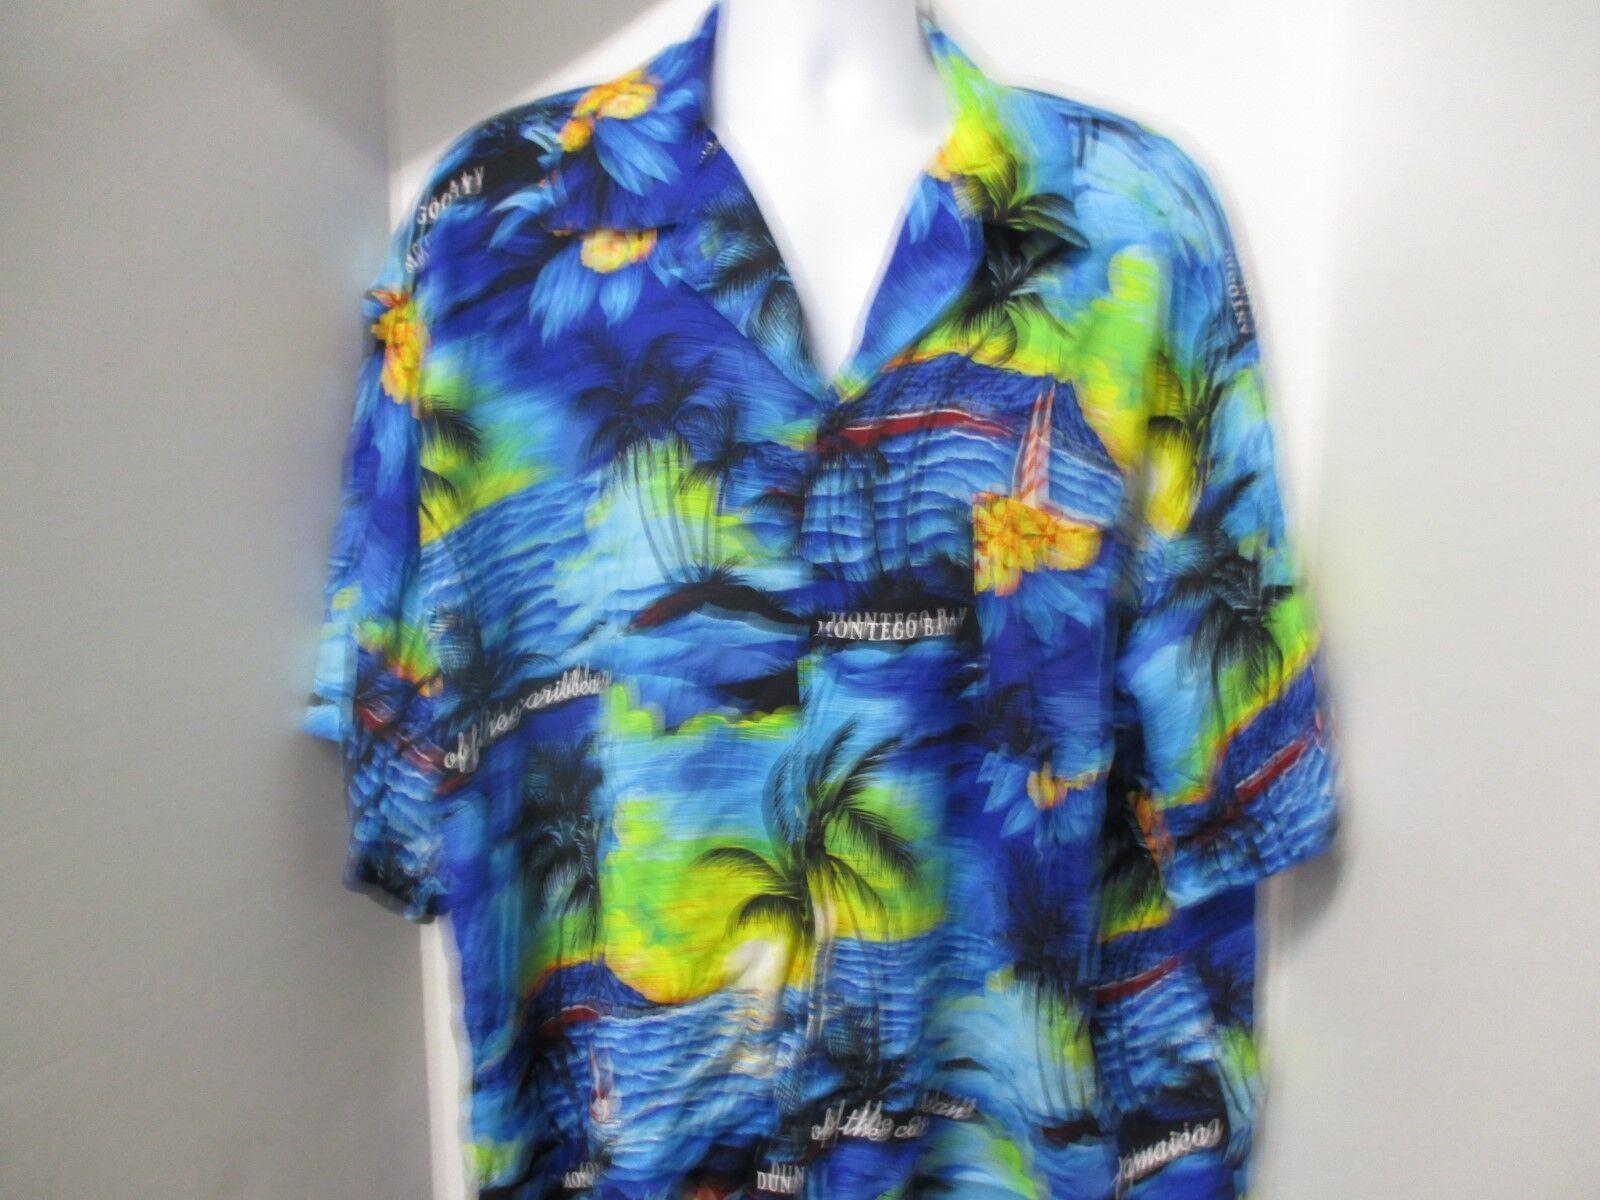 Vibrant colord Hawaiian Shirt, Unknown Manufacturer, Ocho Rios, Jamaica, XL